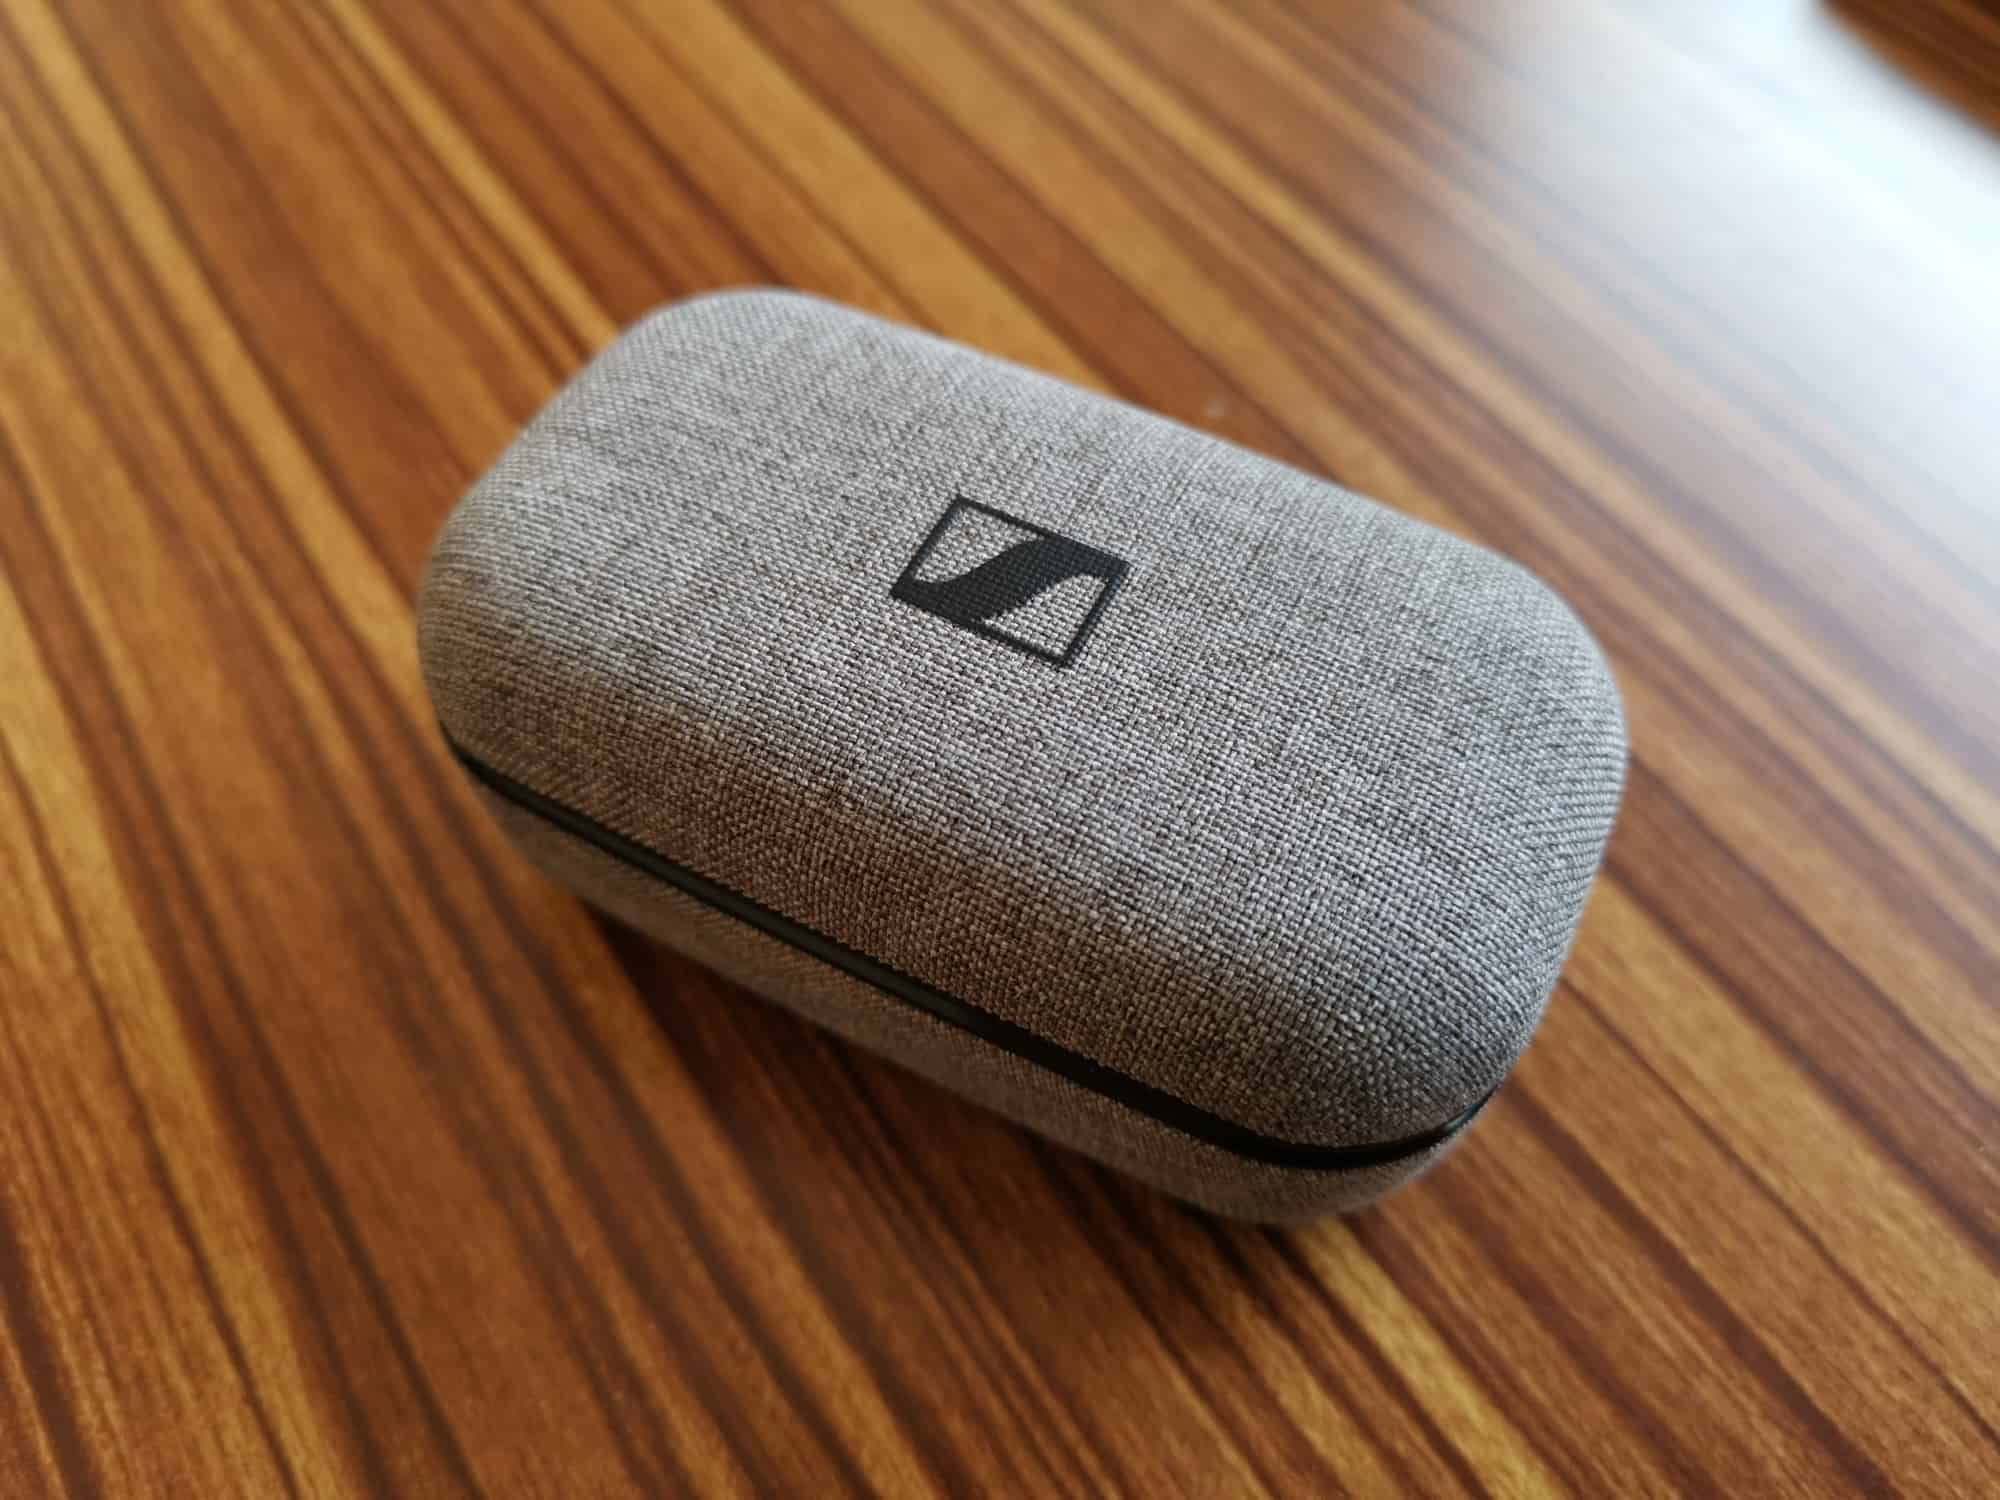 sennheiser momentum - รีวิว Sennheiser Momentum True Wireless